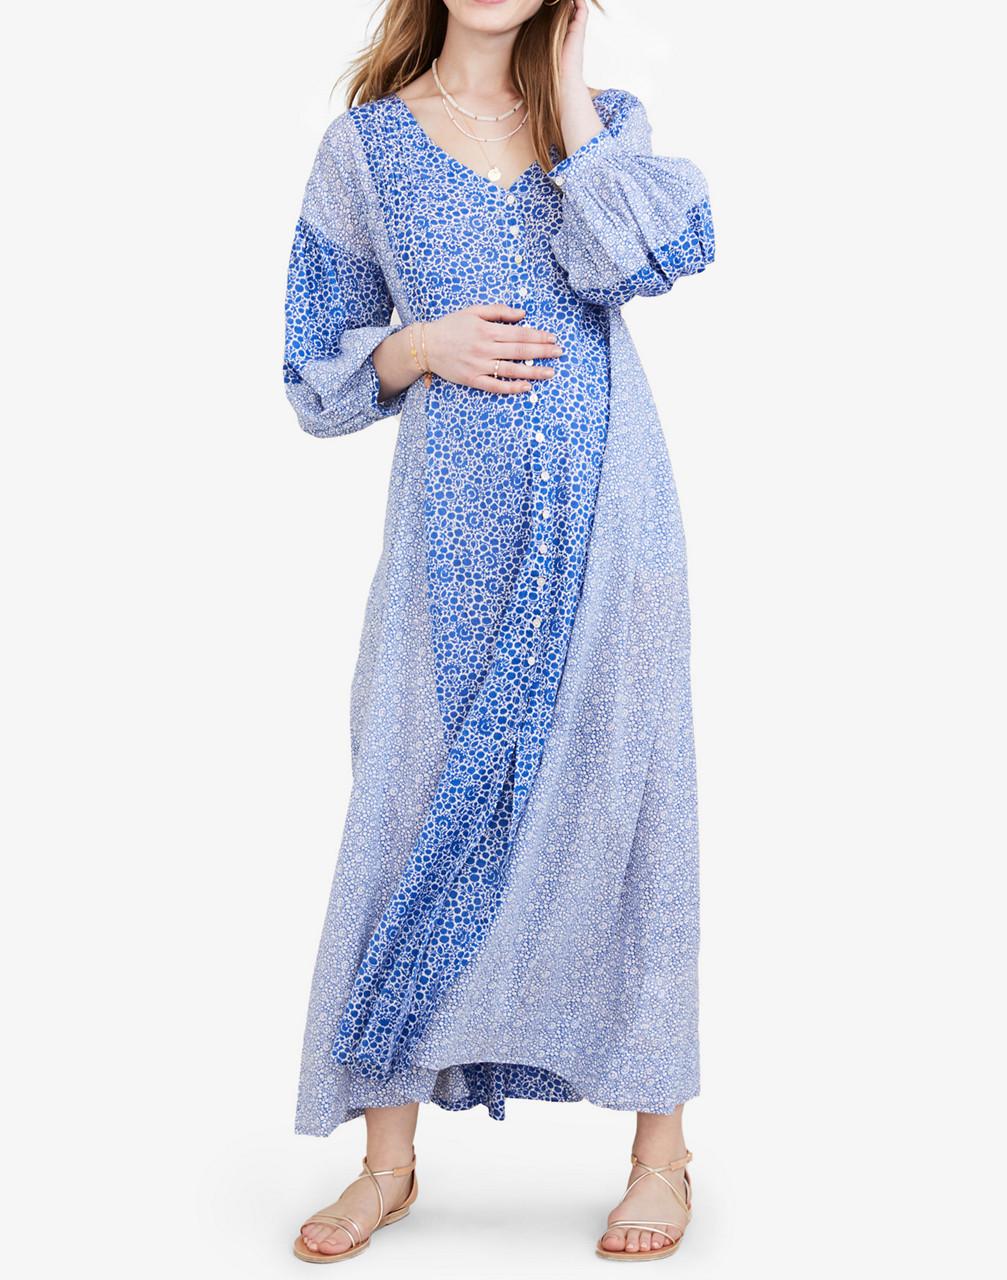 Vintage Maternity Dresses and Clothes HATCH Collectionreg Maternity Nessa Maxi Dress $258.00 AT vintagedancer.com